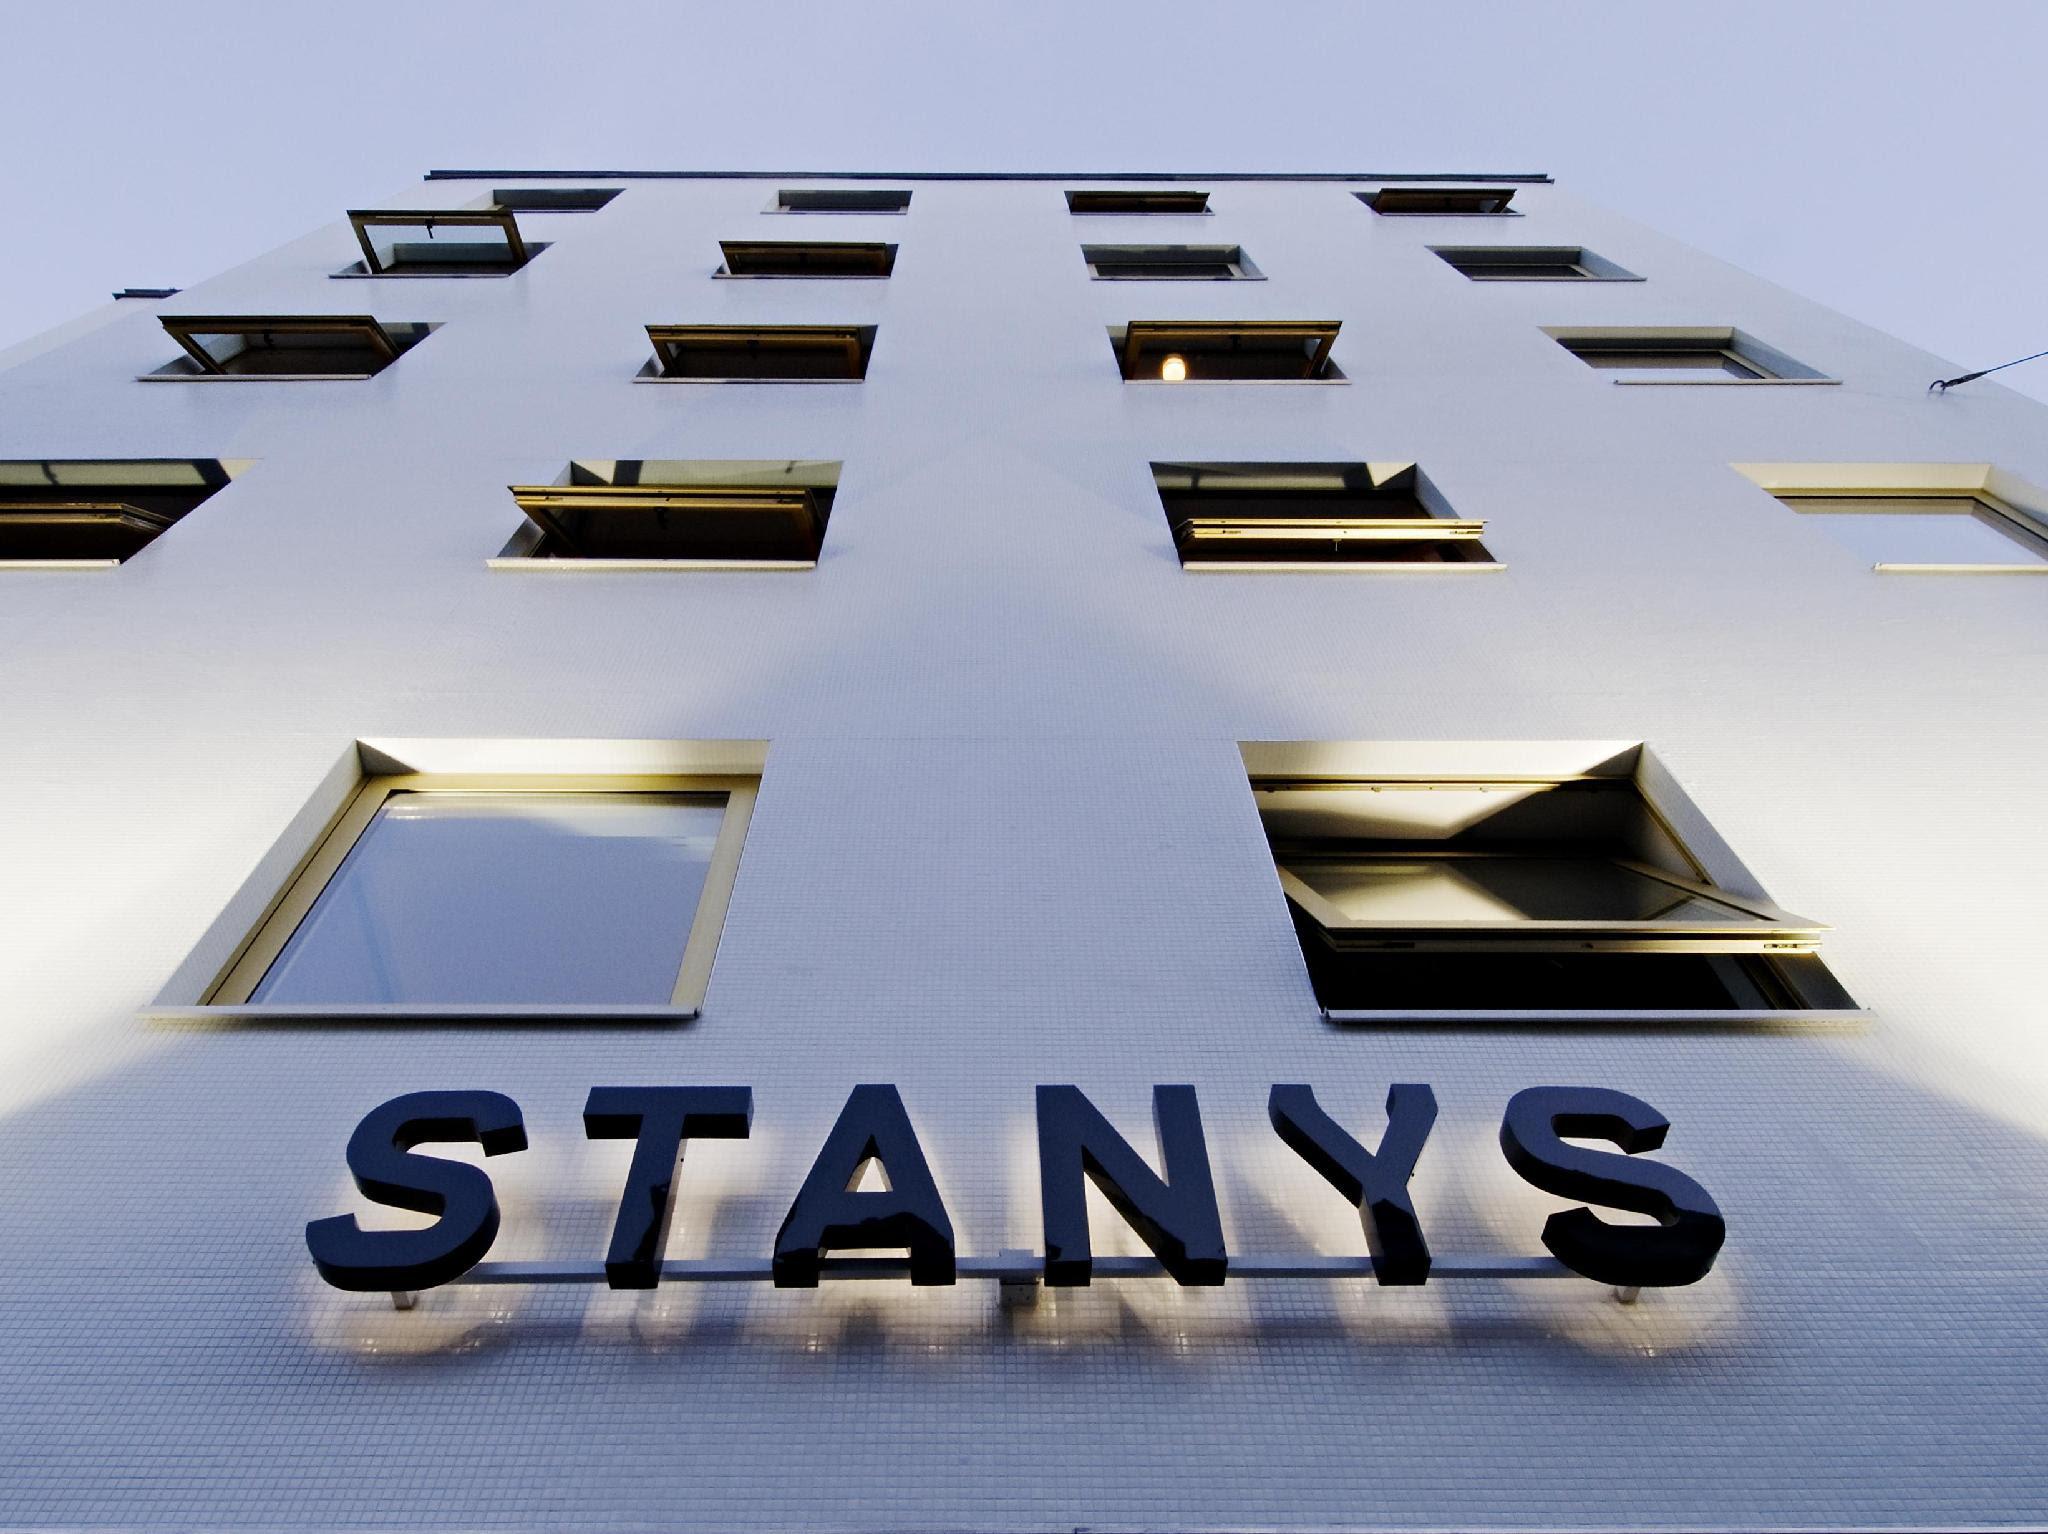 Price Stanys - Das Apartmenthotel